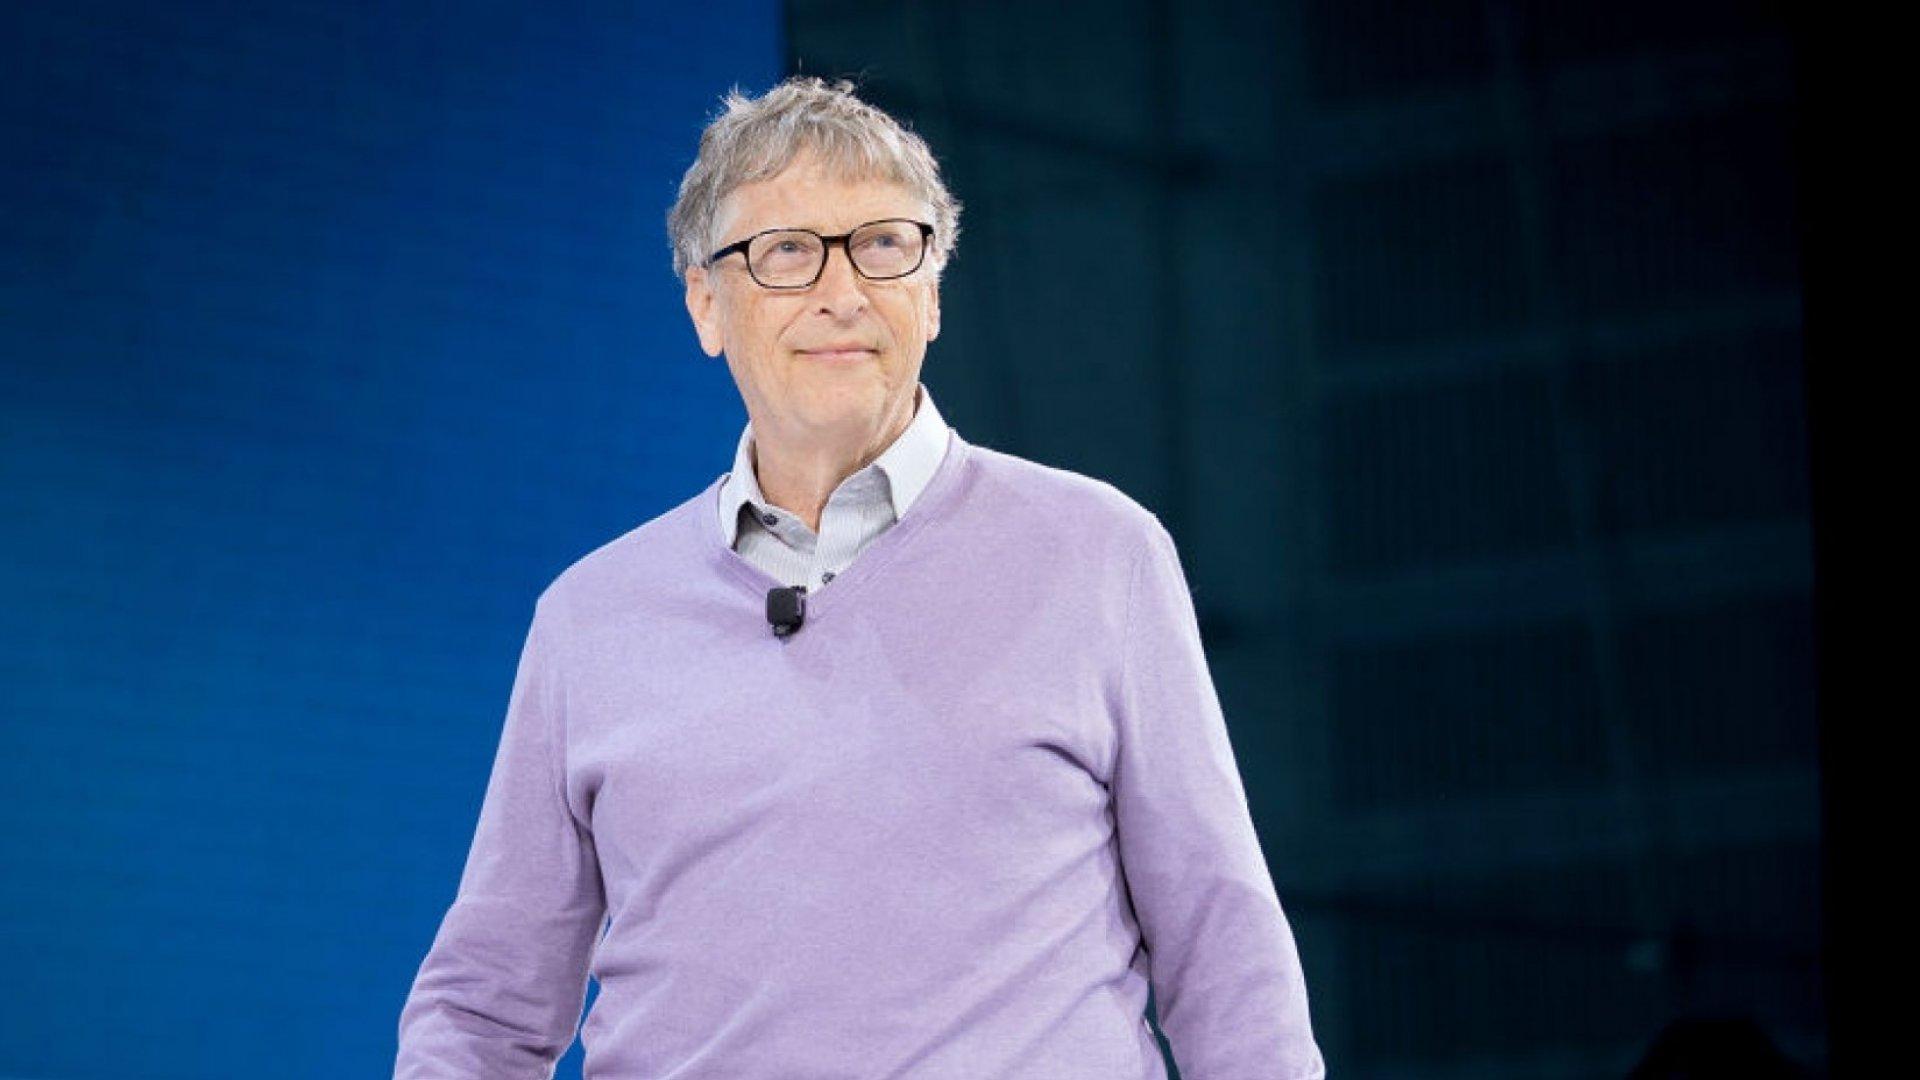 Divorce: Bill Gates May Drop On Billionaires Index –Report